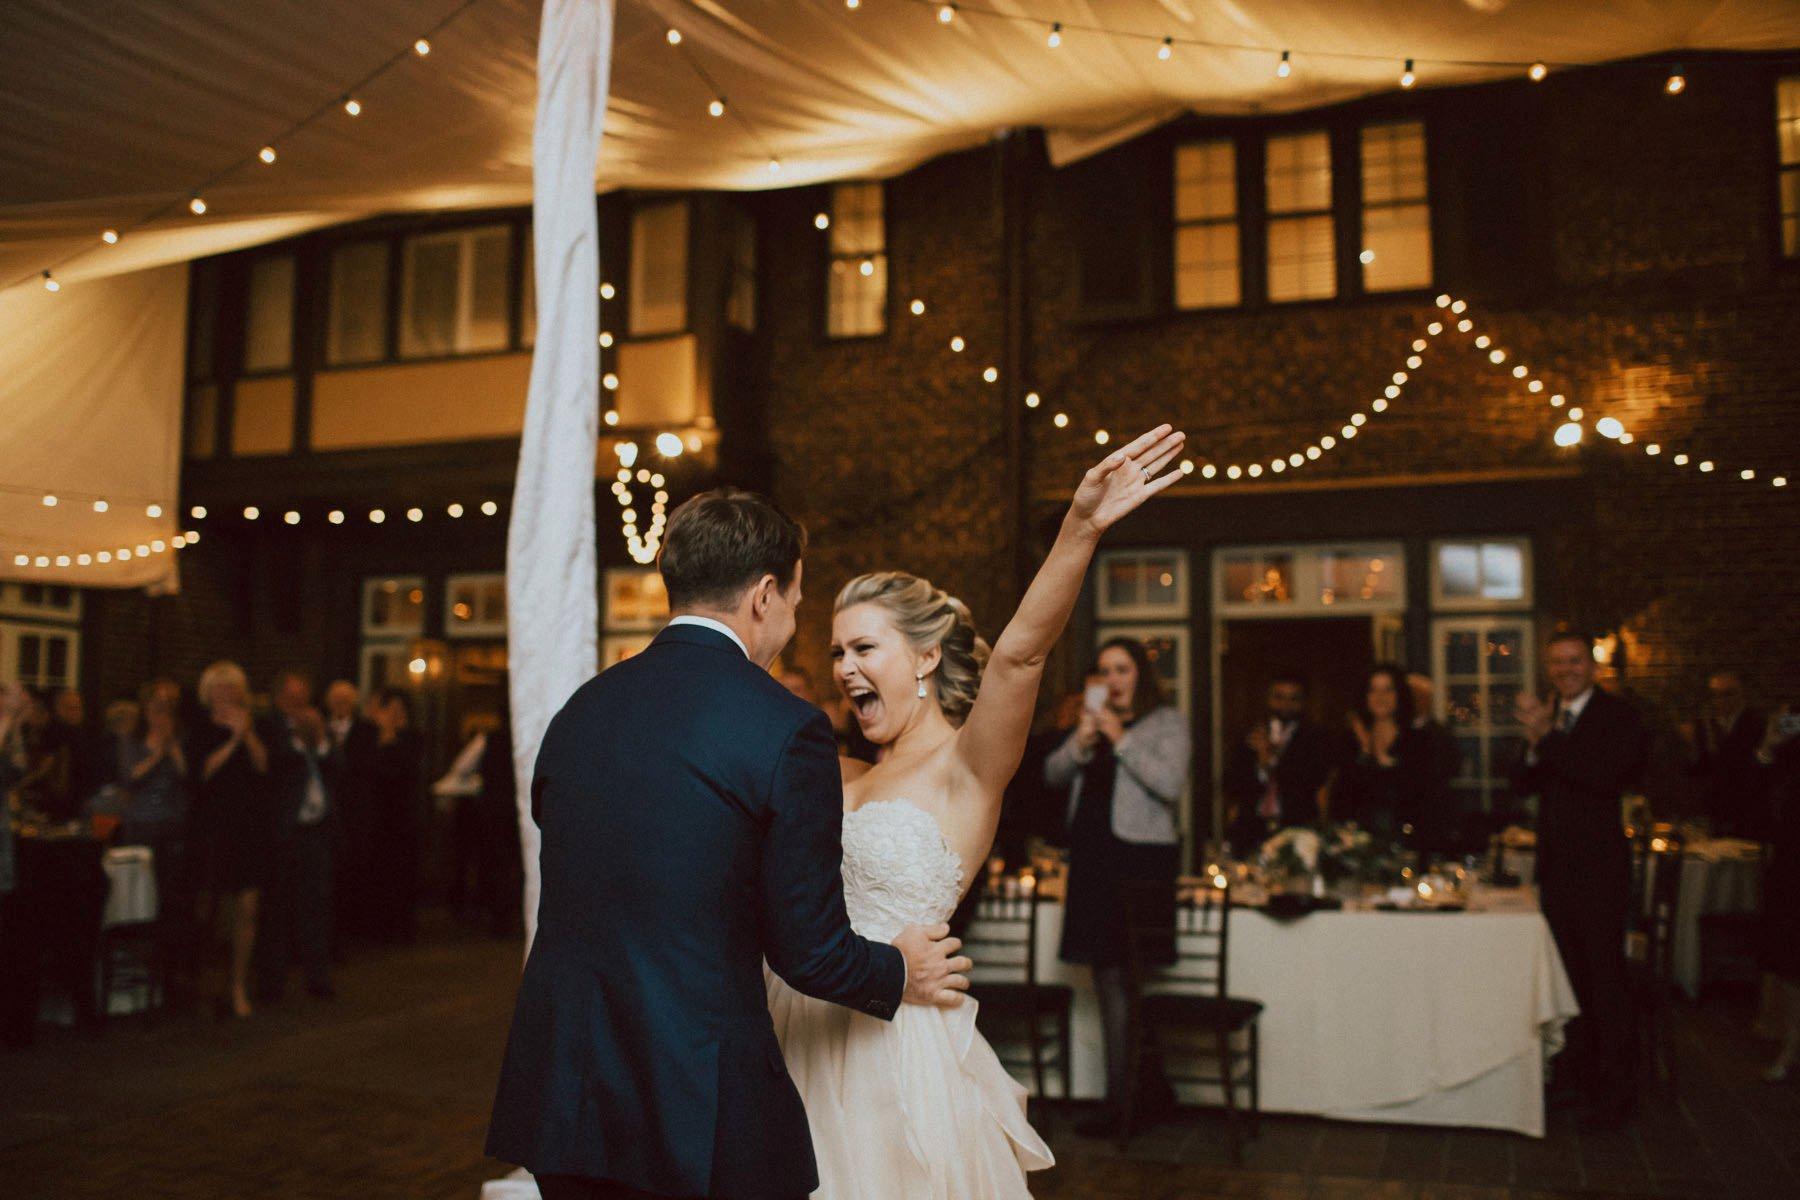 greenville-country-club-wedding-130.jpg